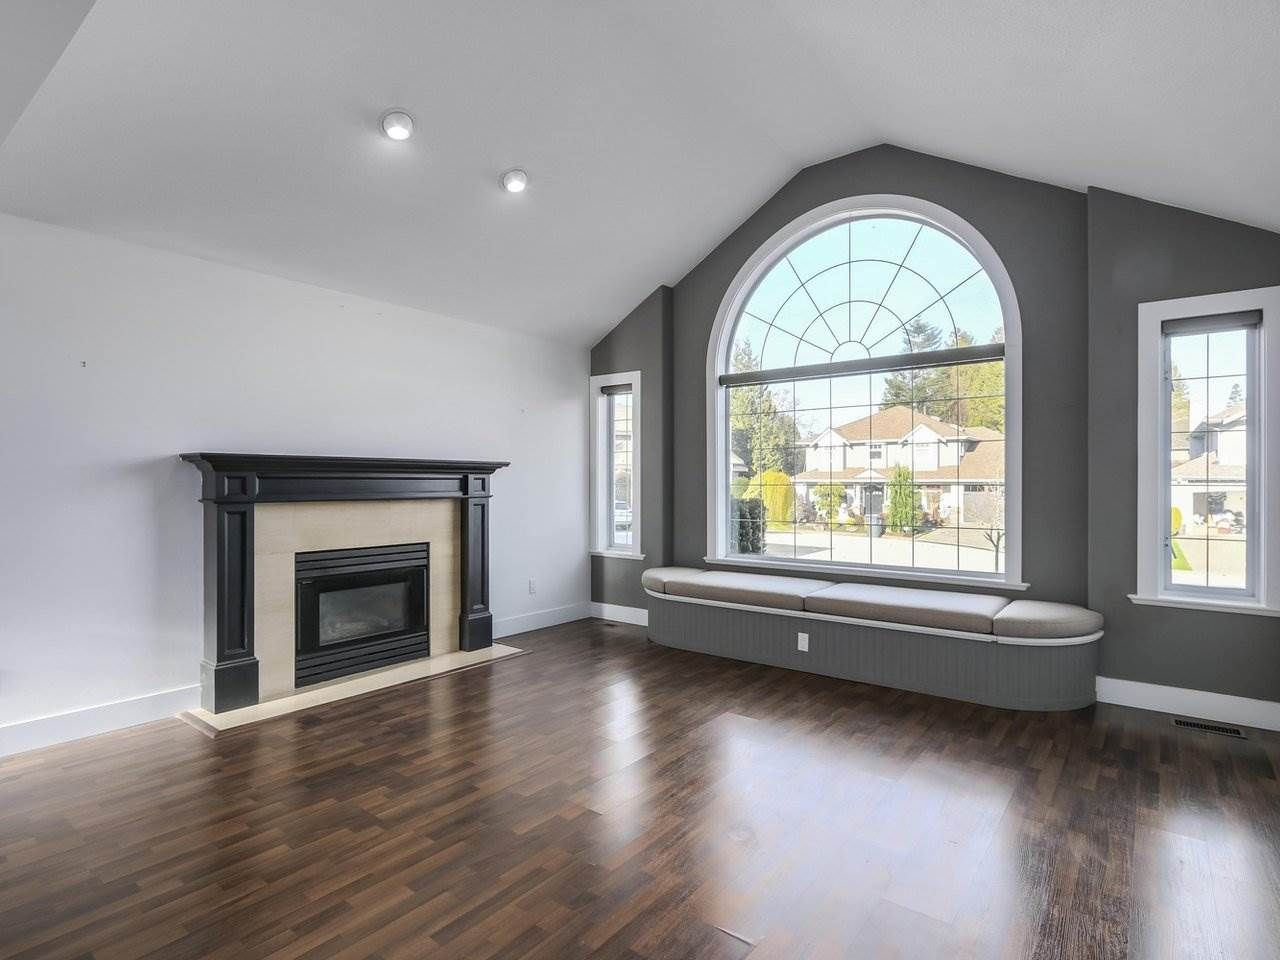 Photo 3: Photos: 12548 25A Avenue in Surrey: Crescent Bch Ocean Pk. House for sale (South Surrey White Rock)  : MLS®# R2328780